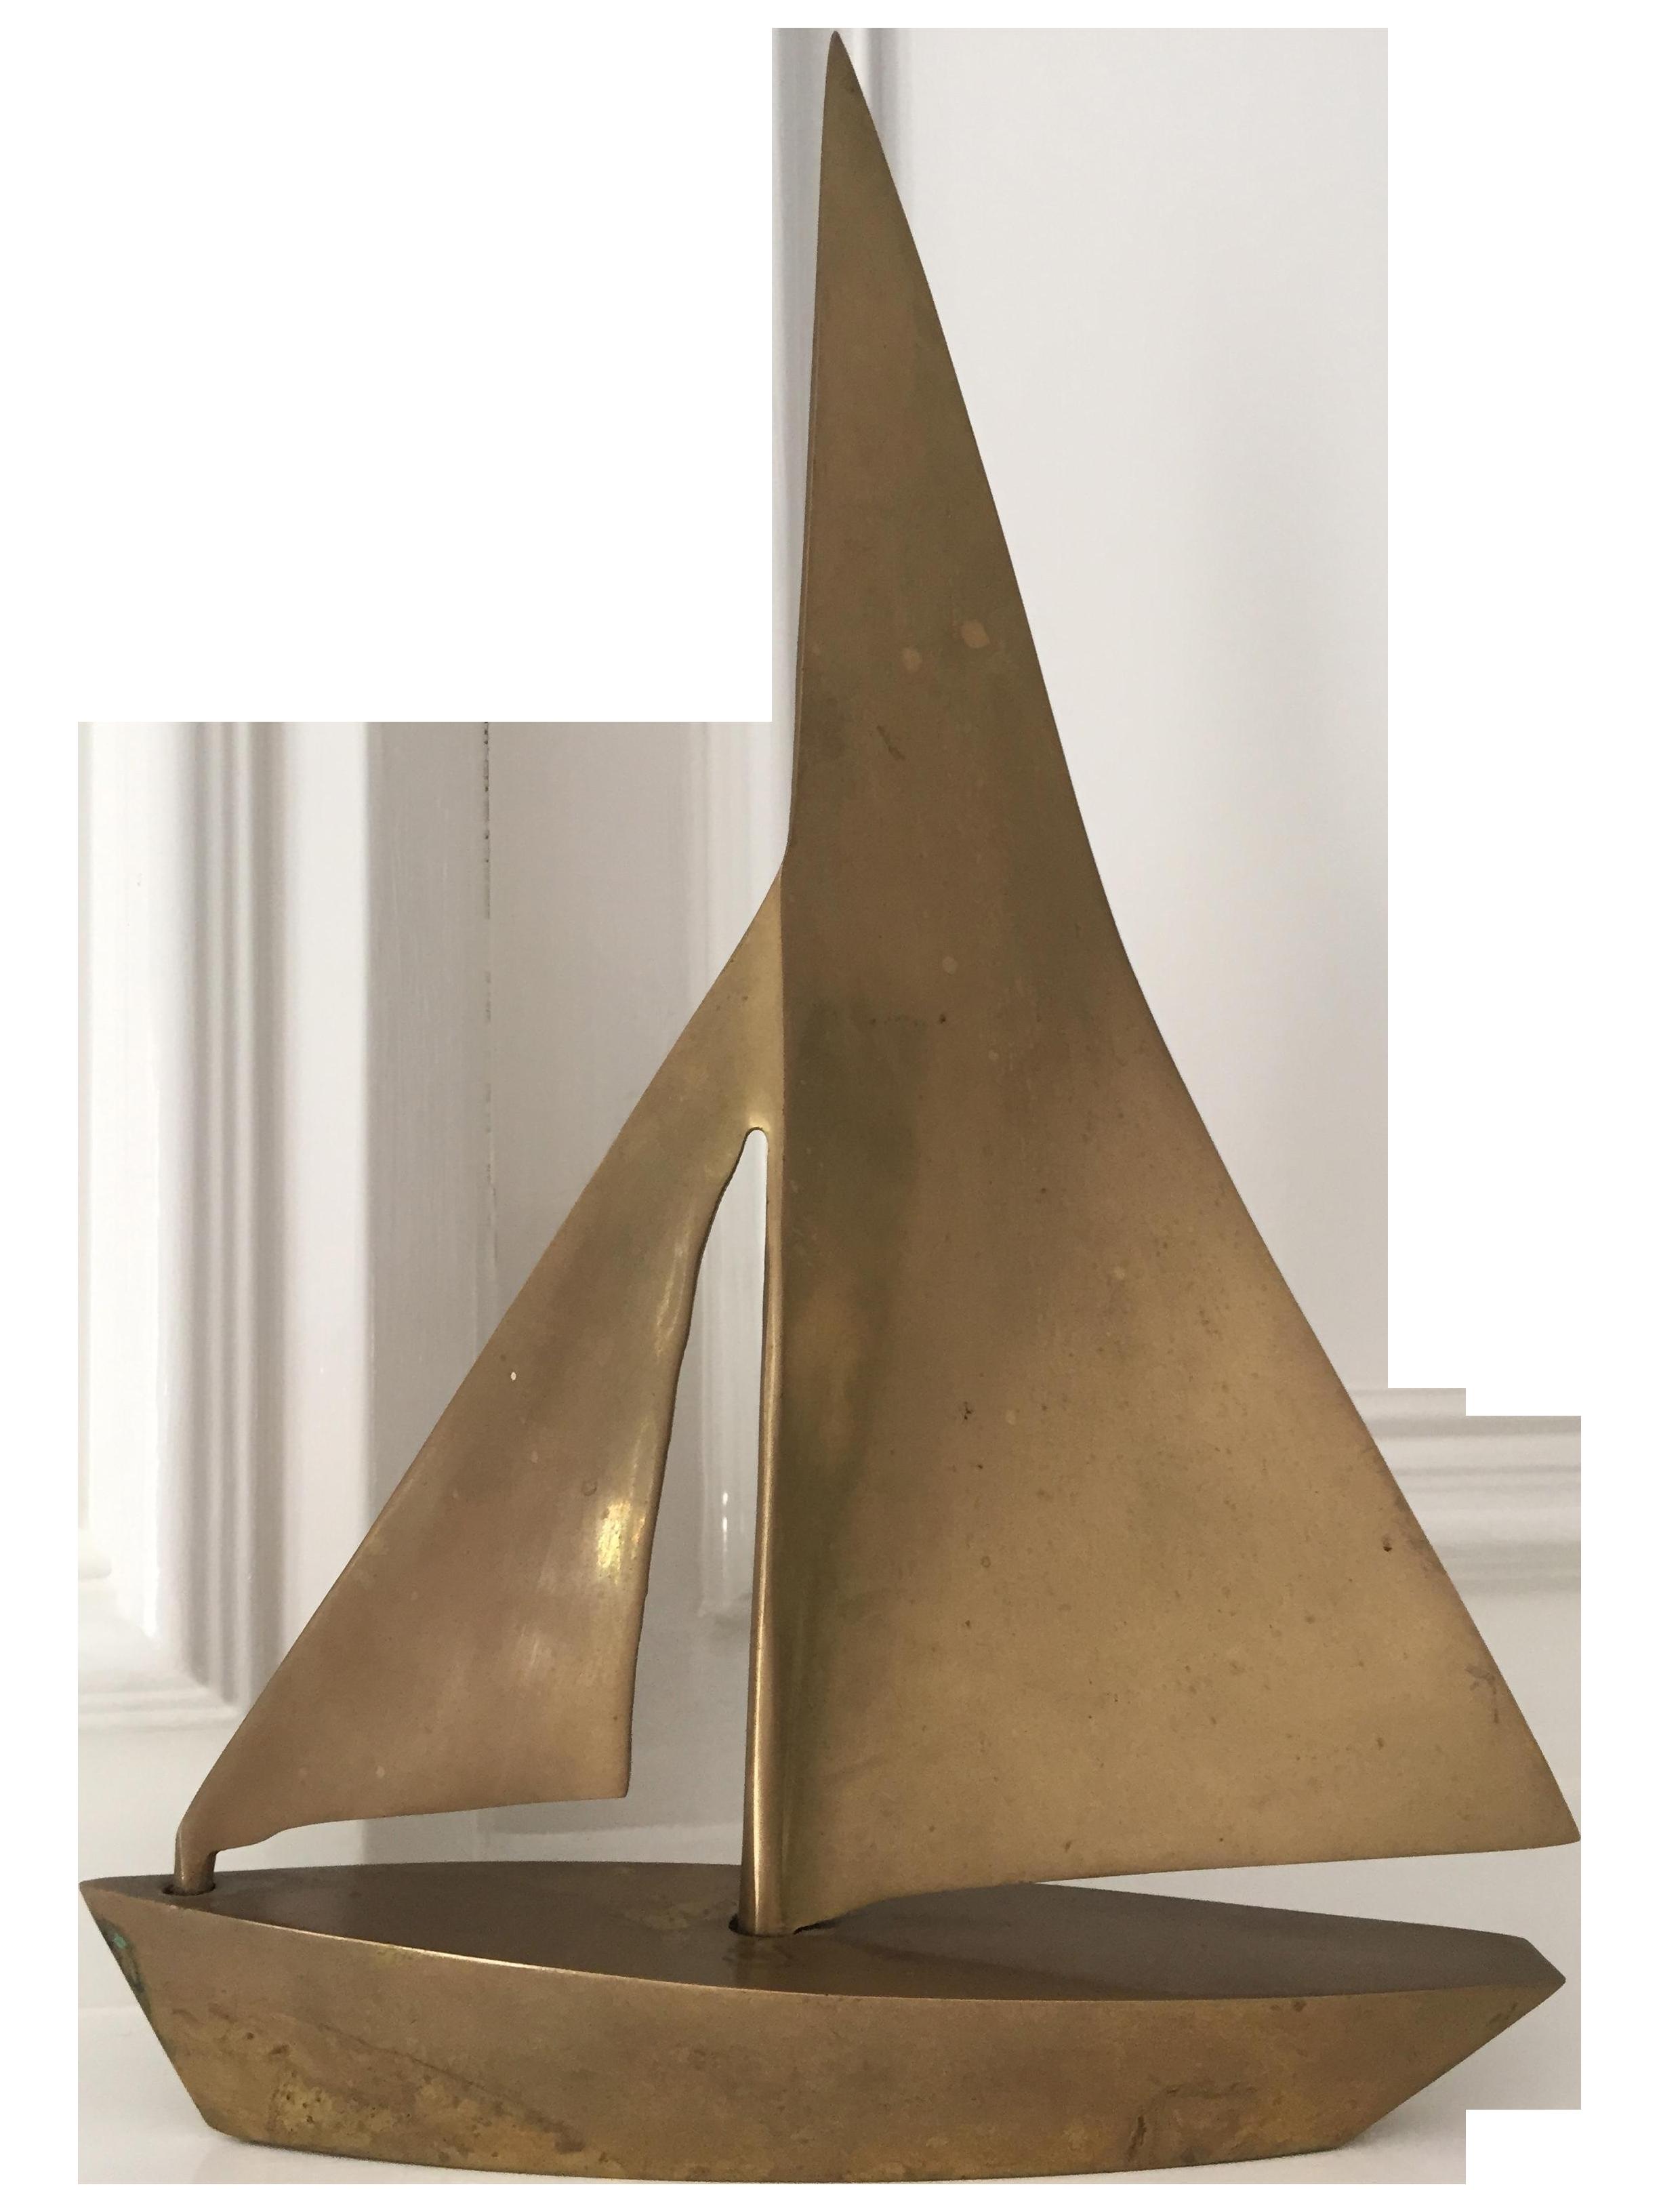 MCM Vintage Brass Sailboat | Chairish